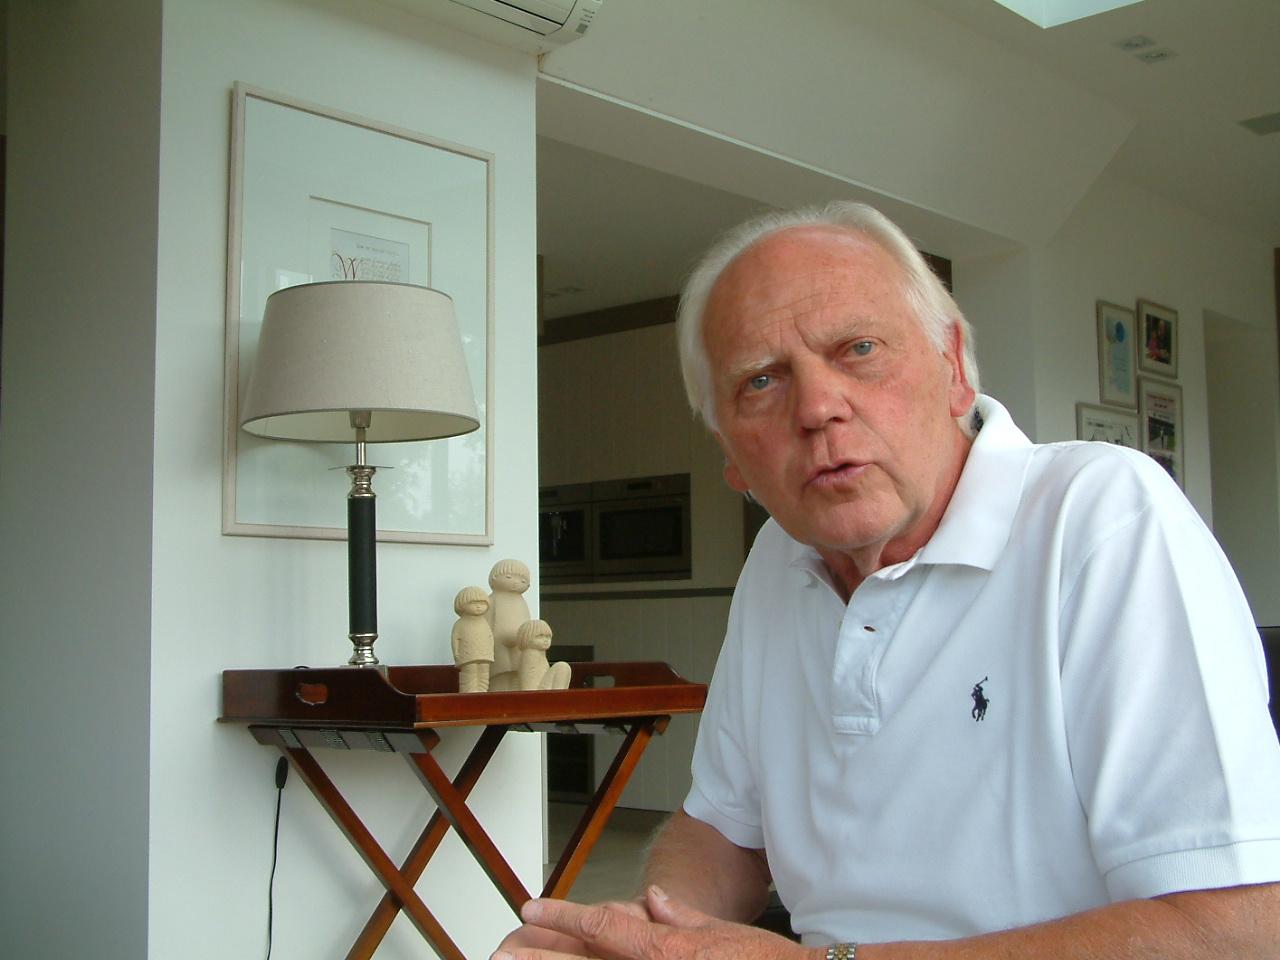 De vorba cu Andre Roodhooft